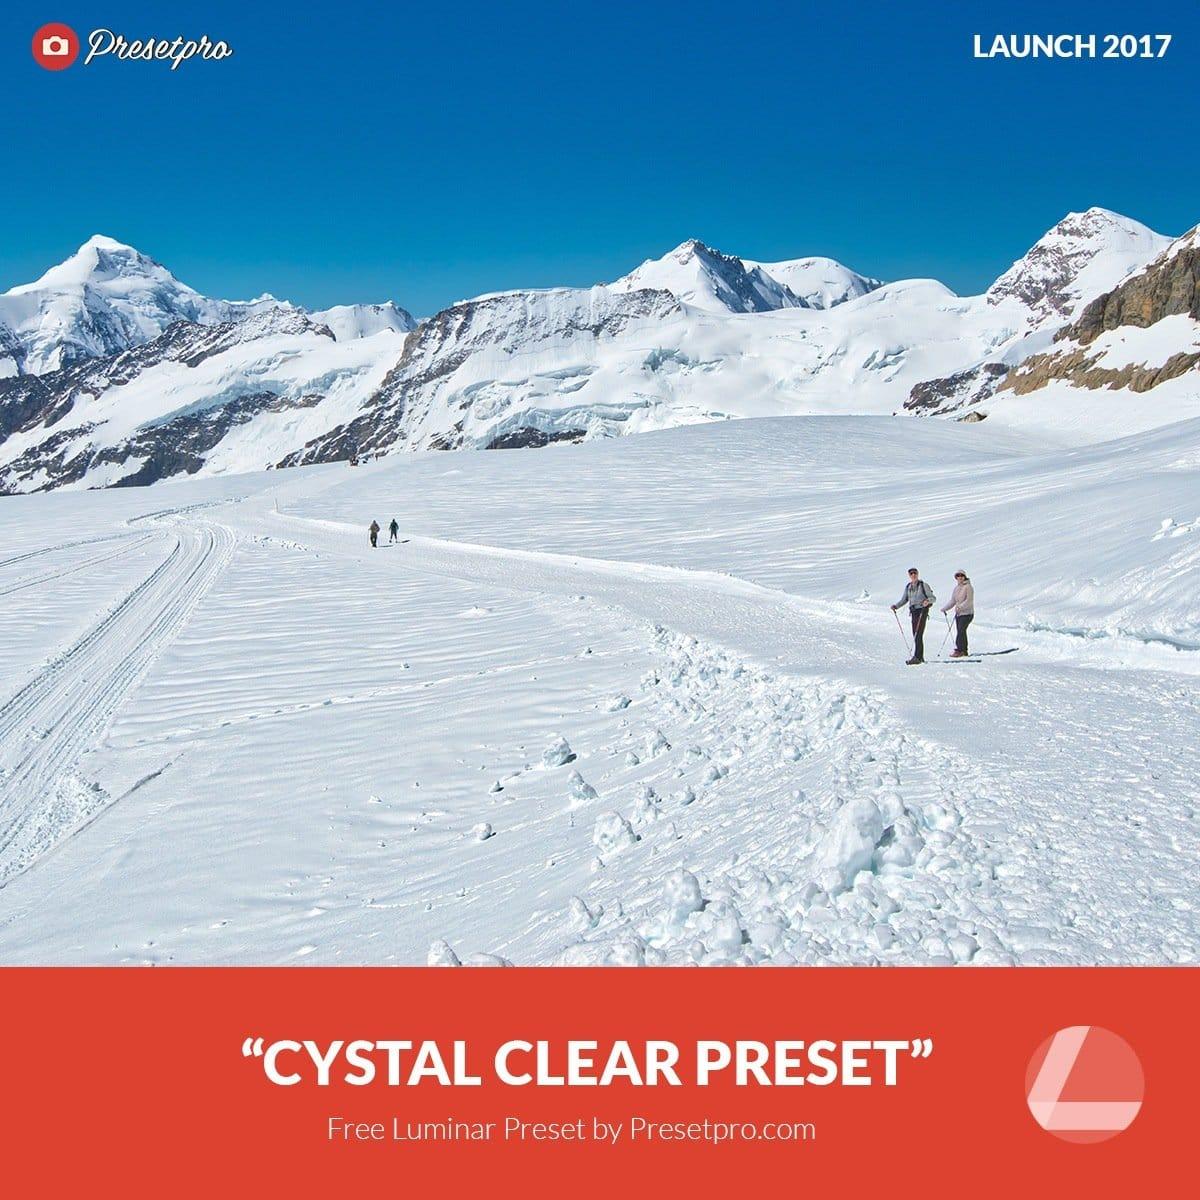 Free-Luminar-Preset-Crystal-Clear